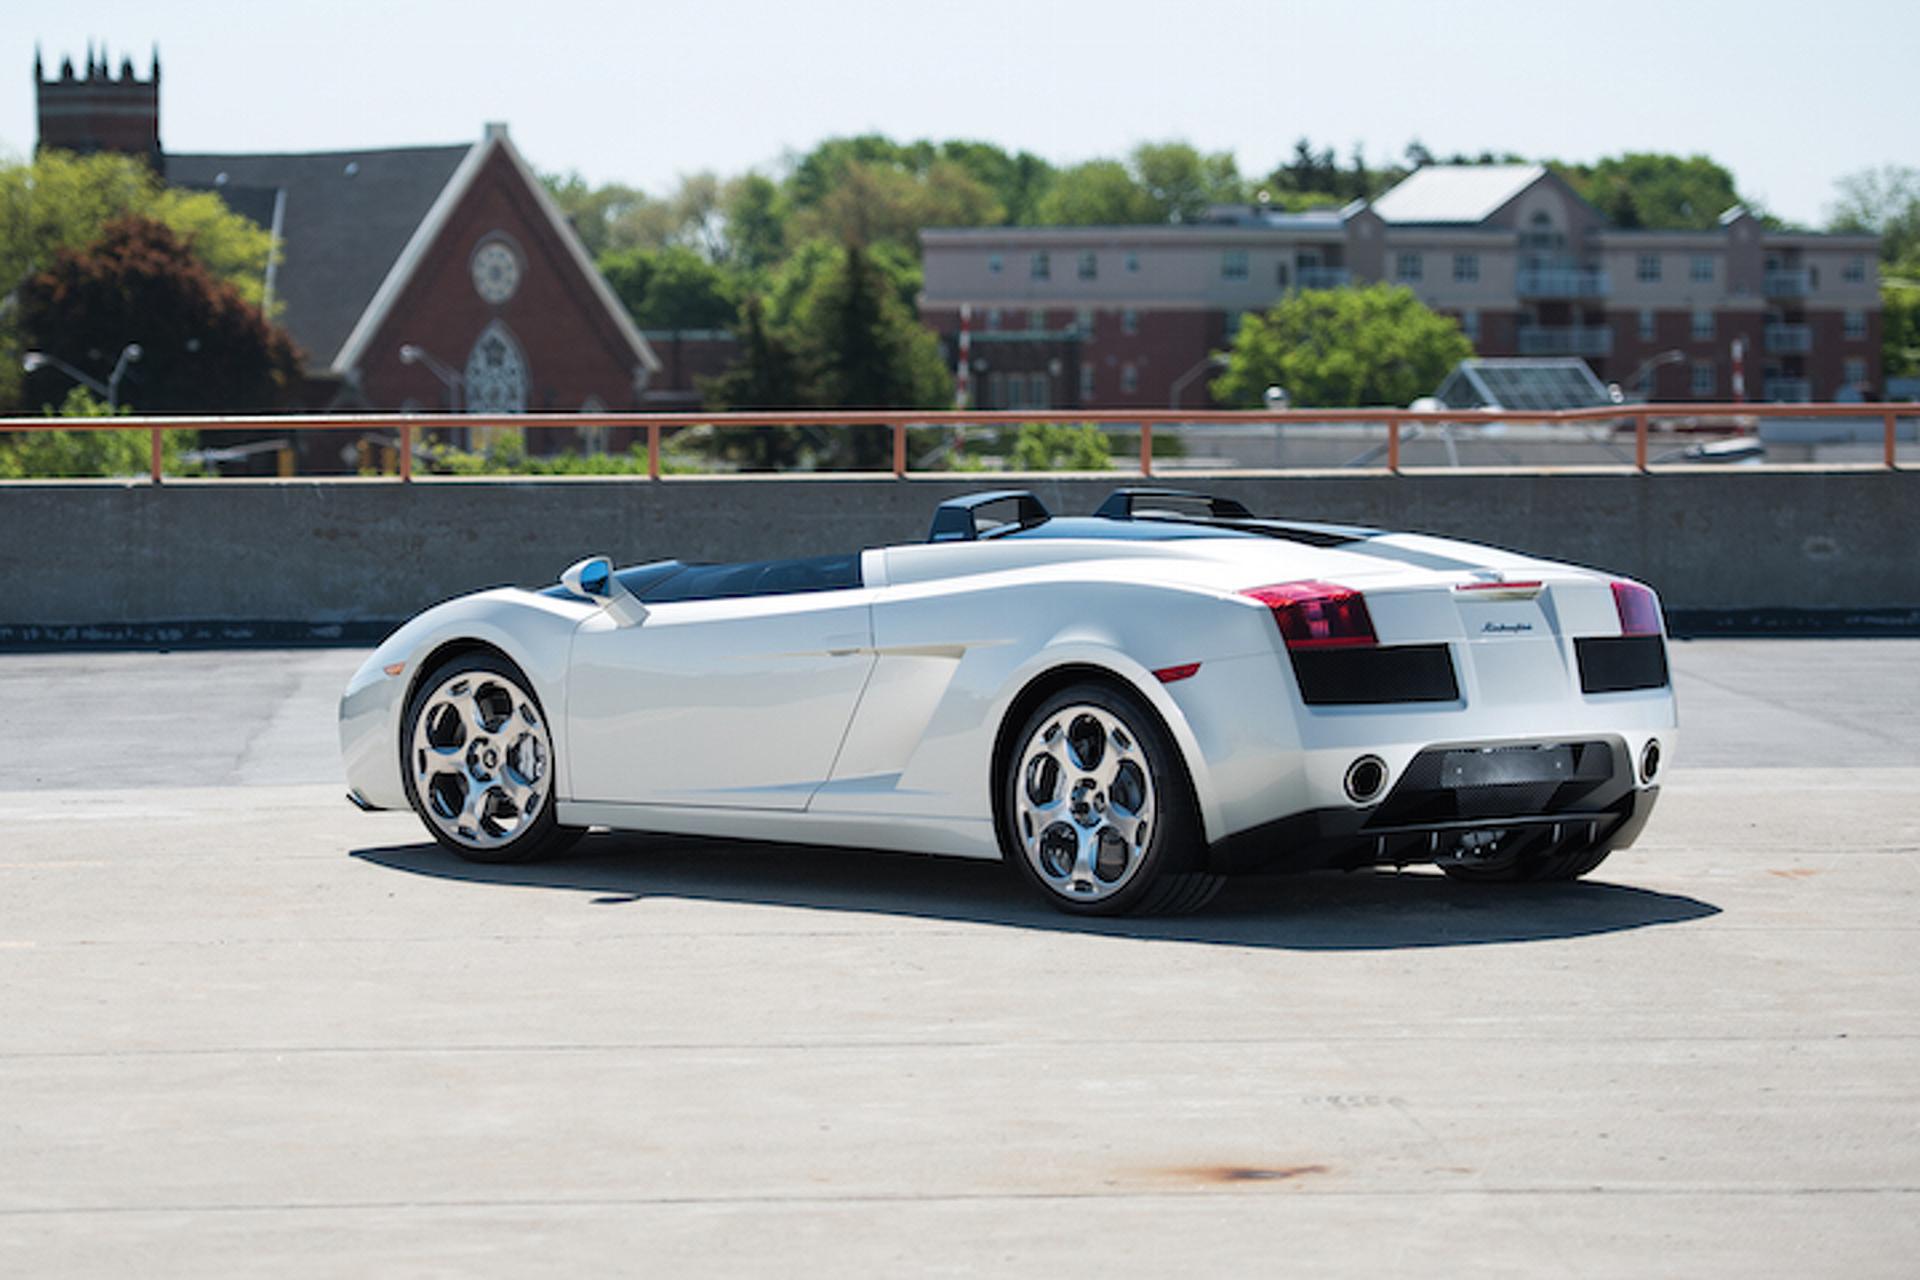 Rare Lamborghini Concept to Be Auctioned in New York